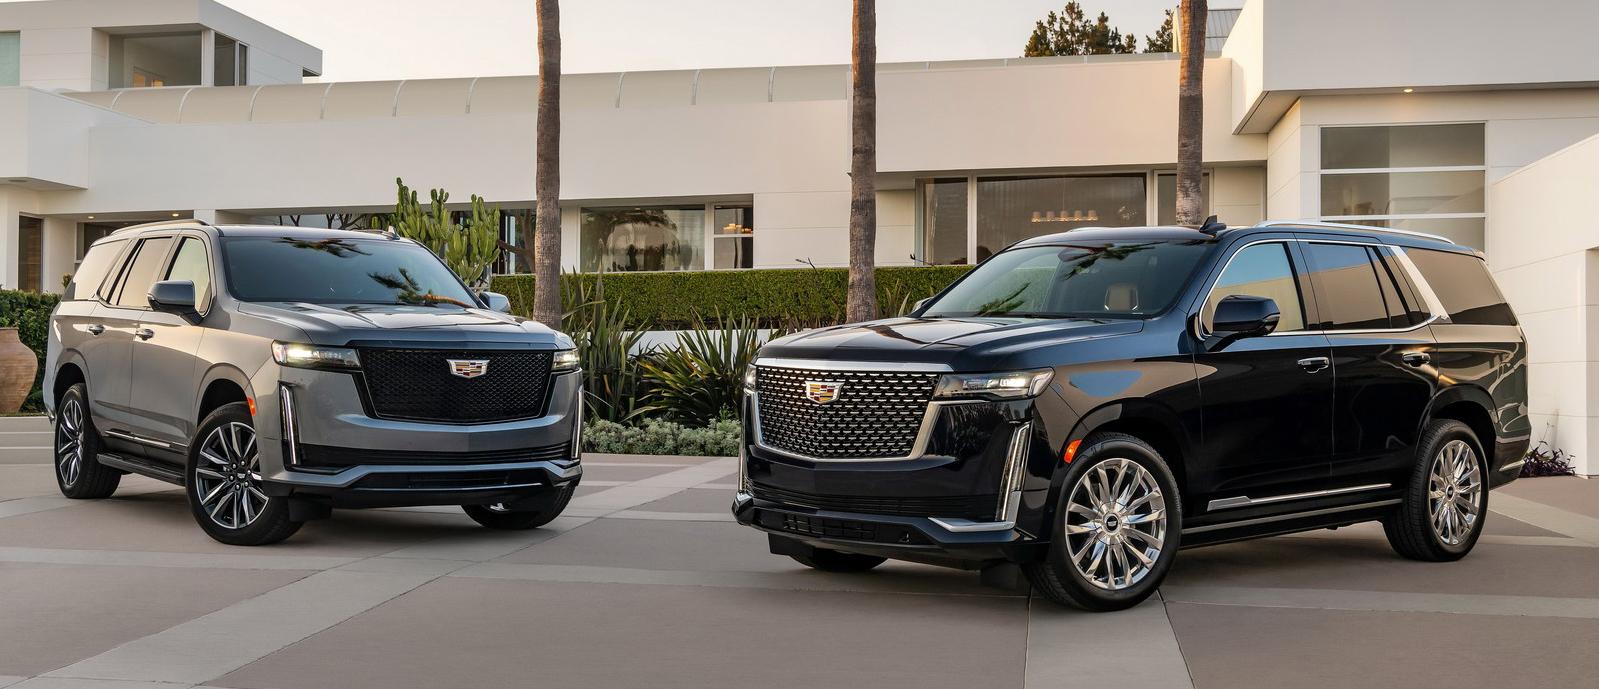 Mẫu Cadillac trong diện triệu hồi. Ảnh: General Motors